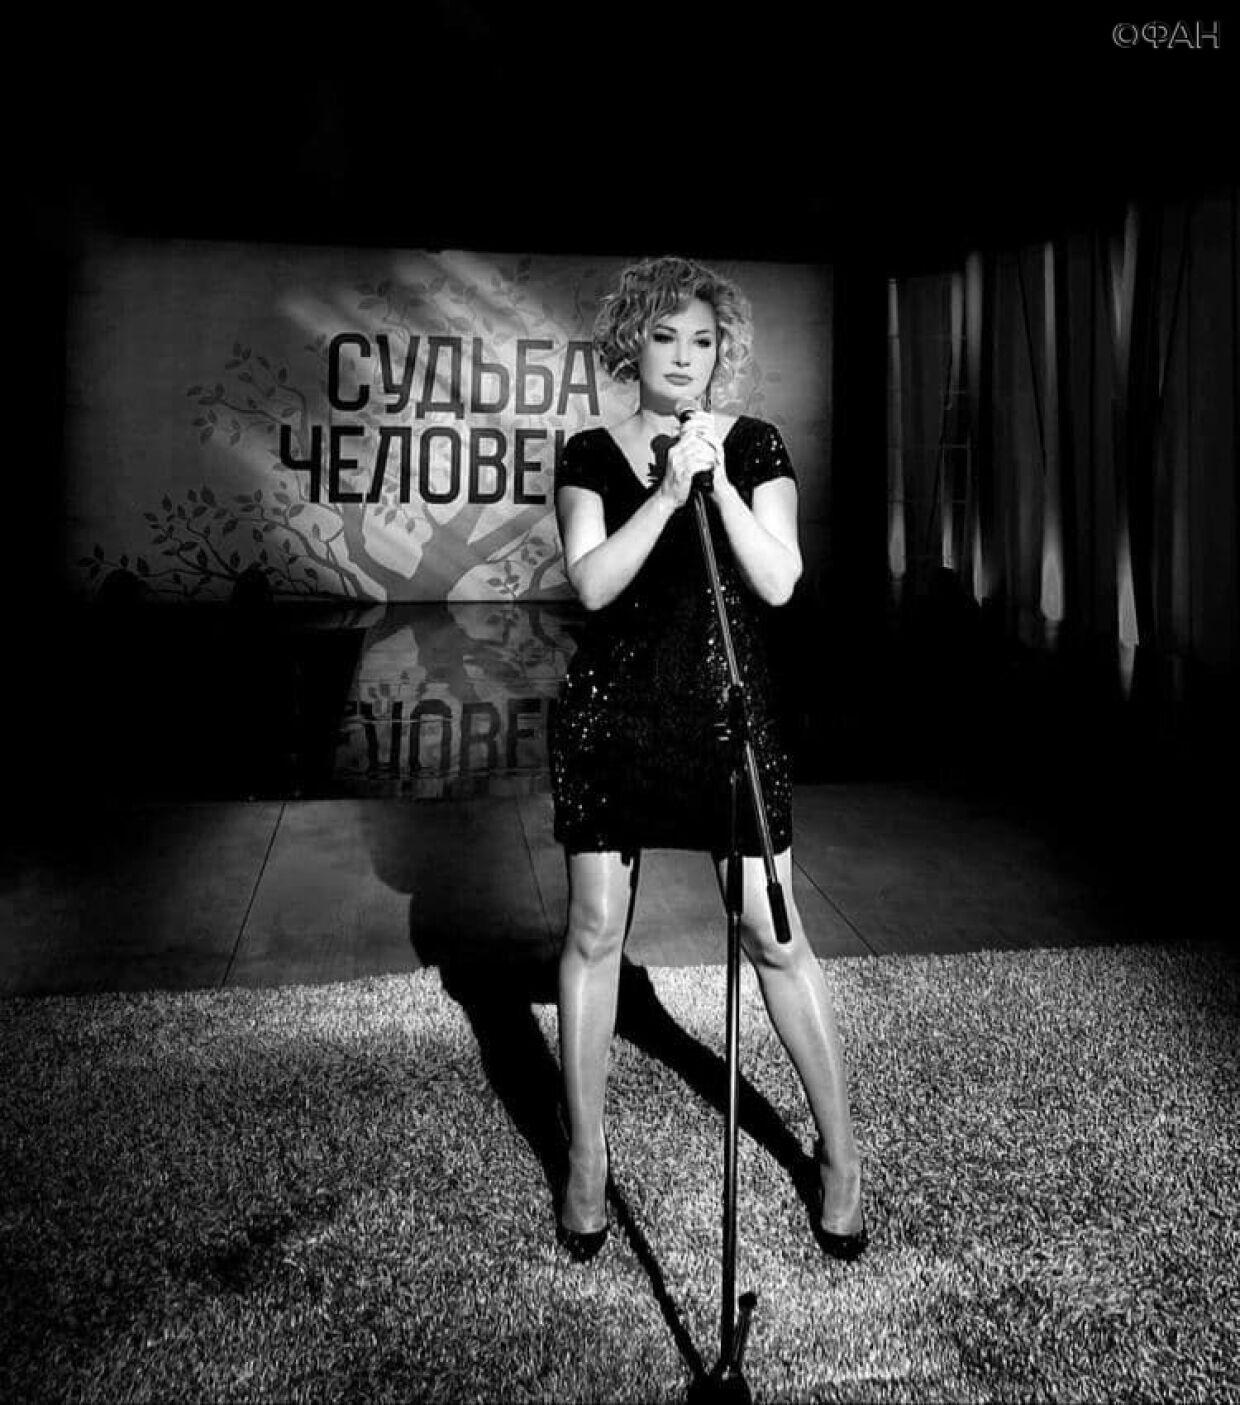 Мария Максакова ответила на критику после съемок в программе «Судьба человека»